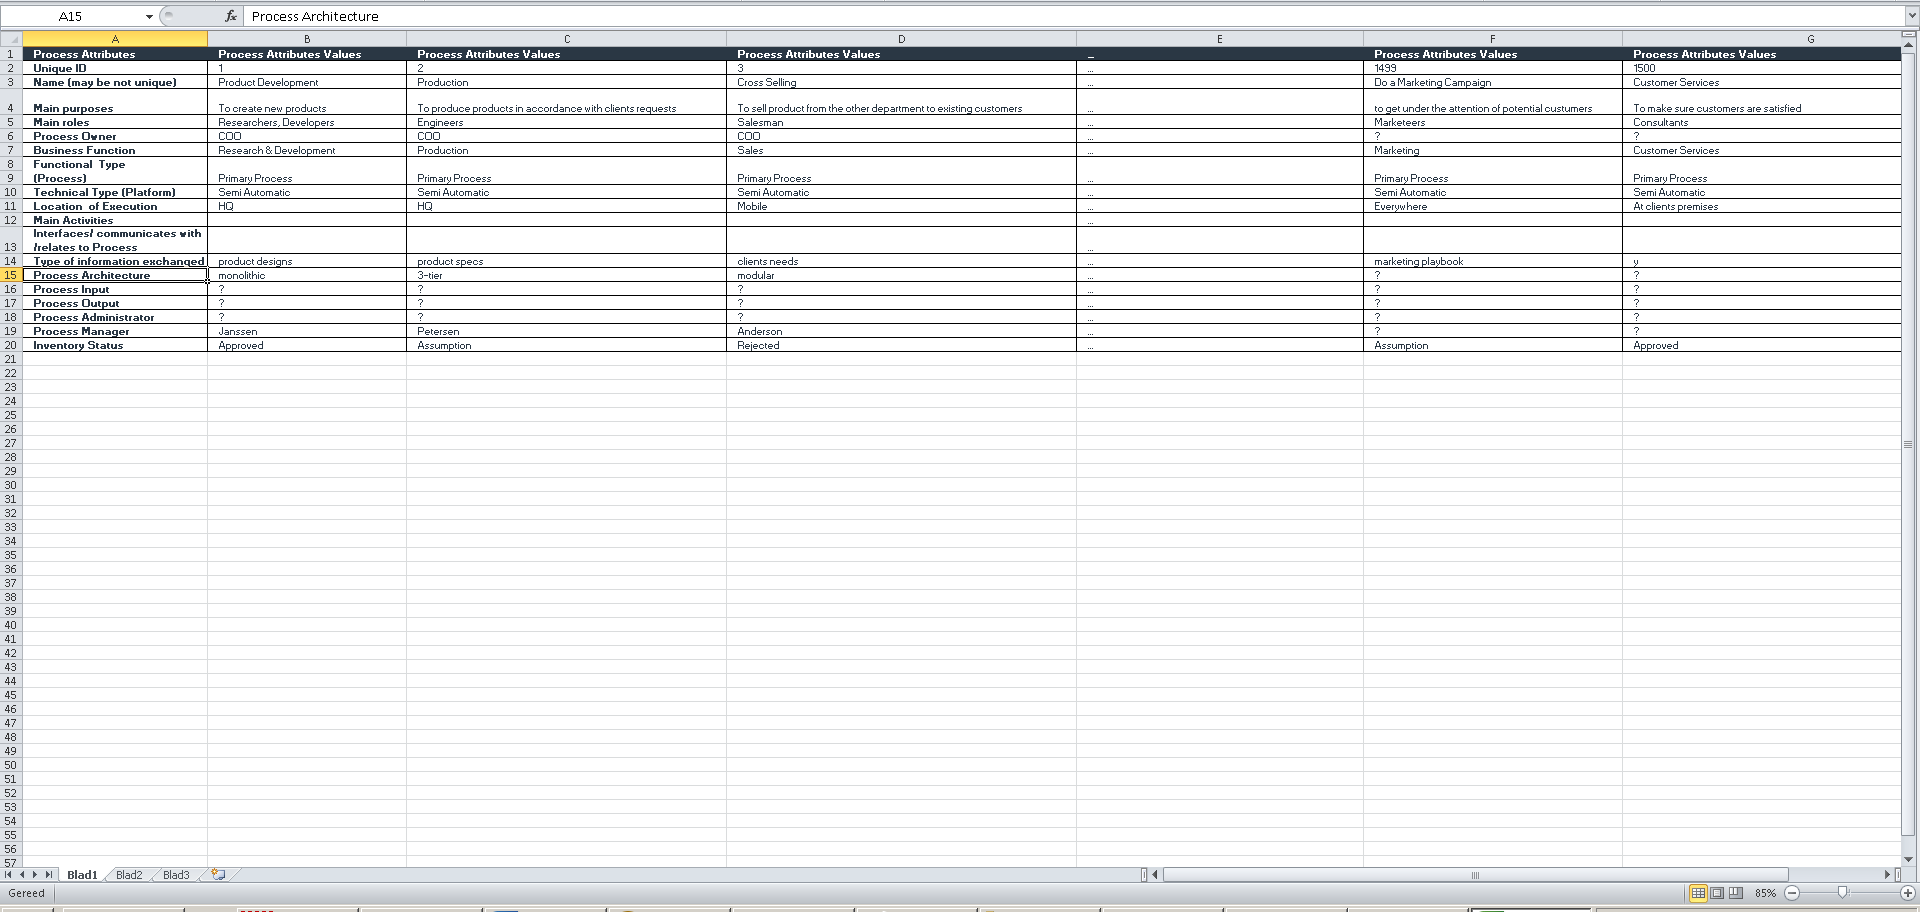 dragon1 excel sheet process rationalization